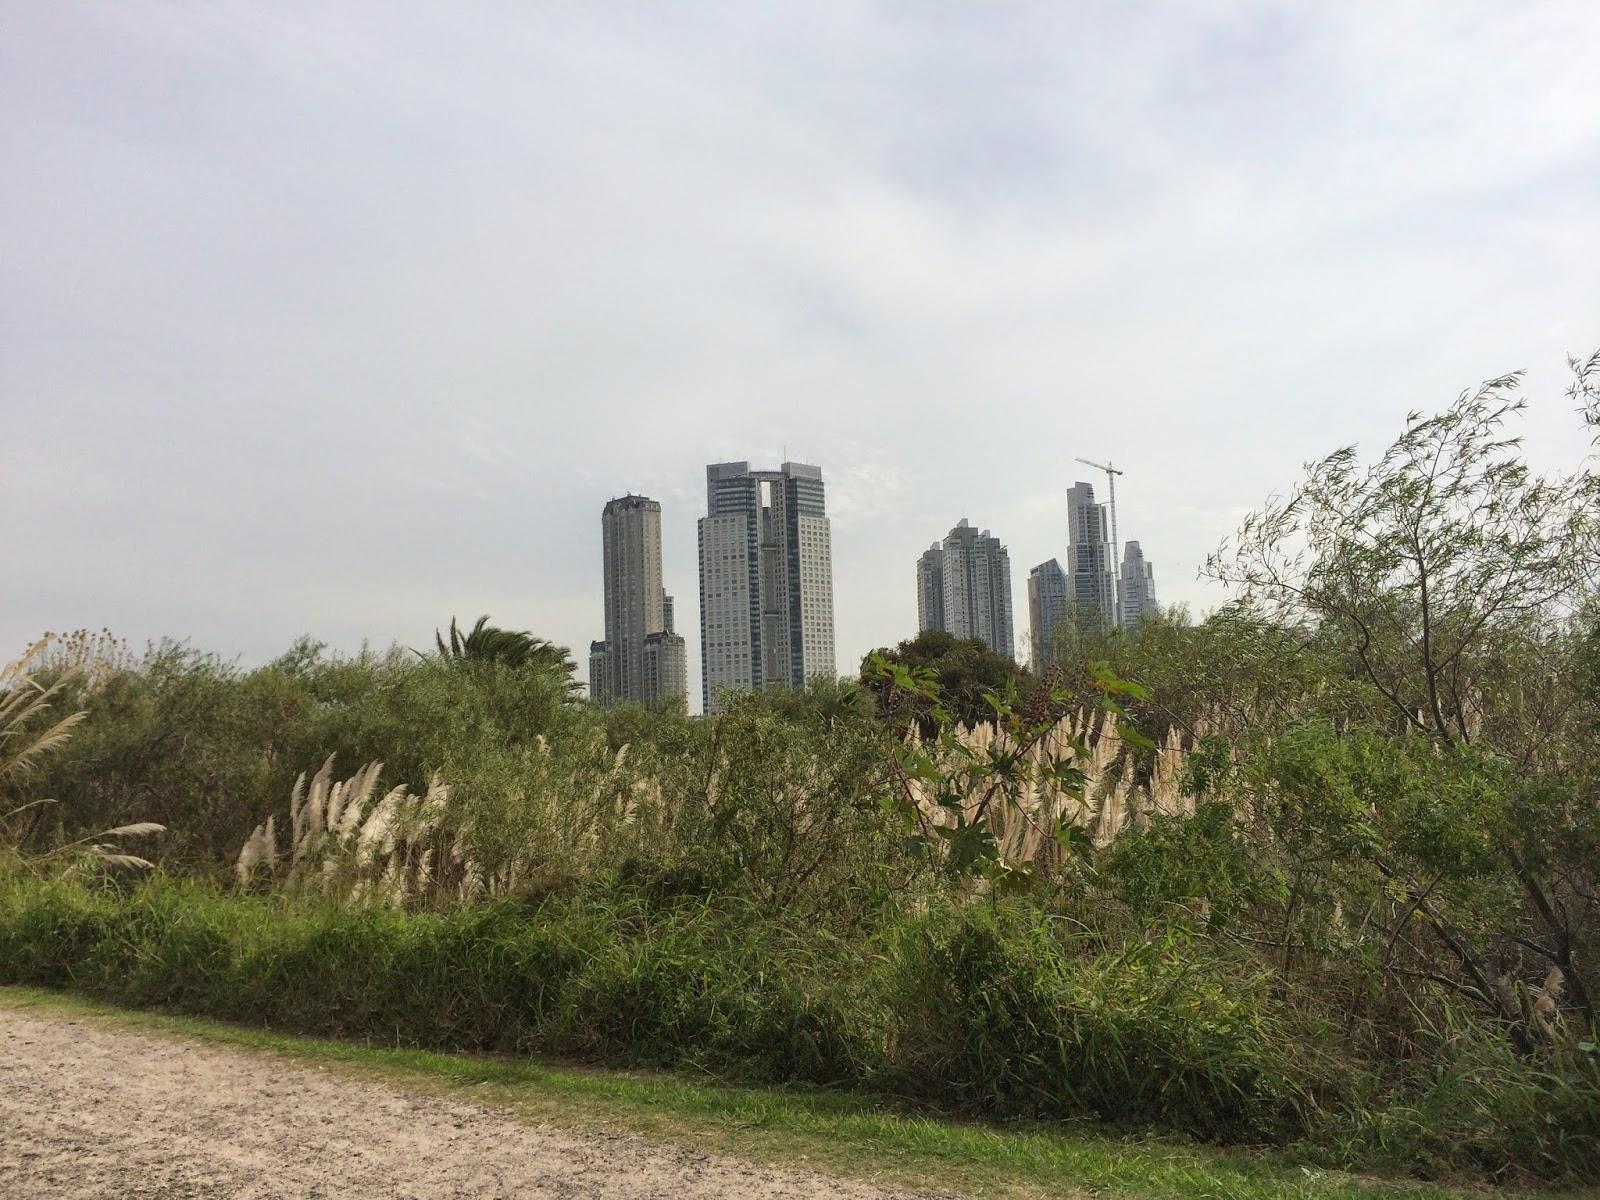 park_reserva_ecologica_argentina_1.jpg